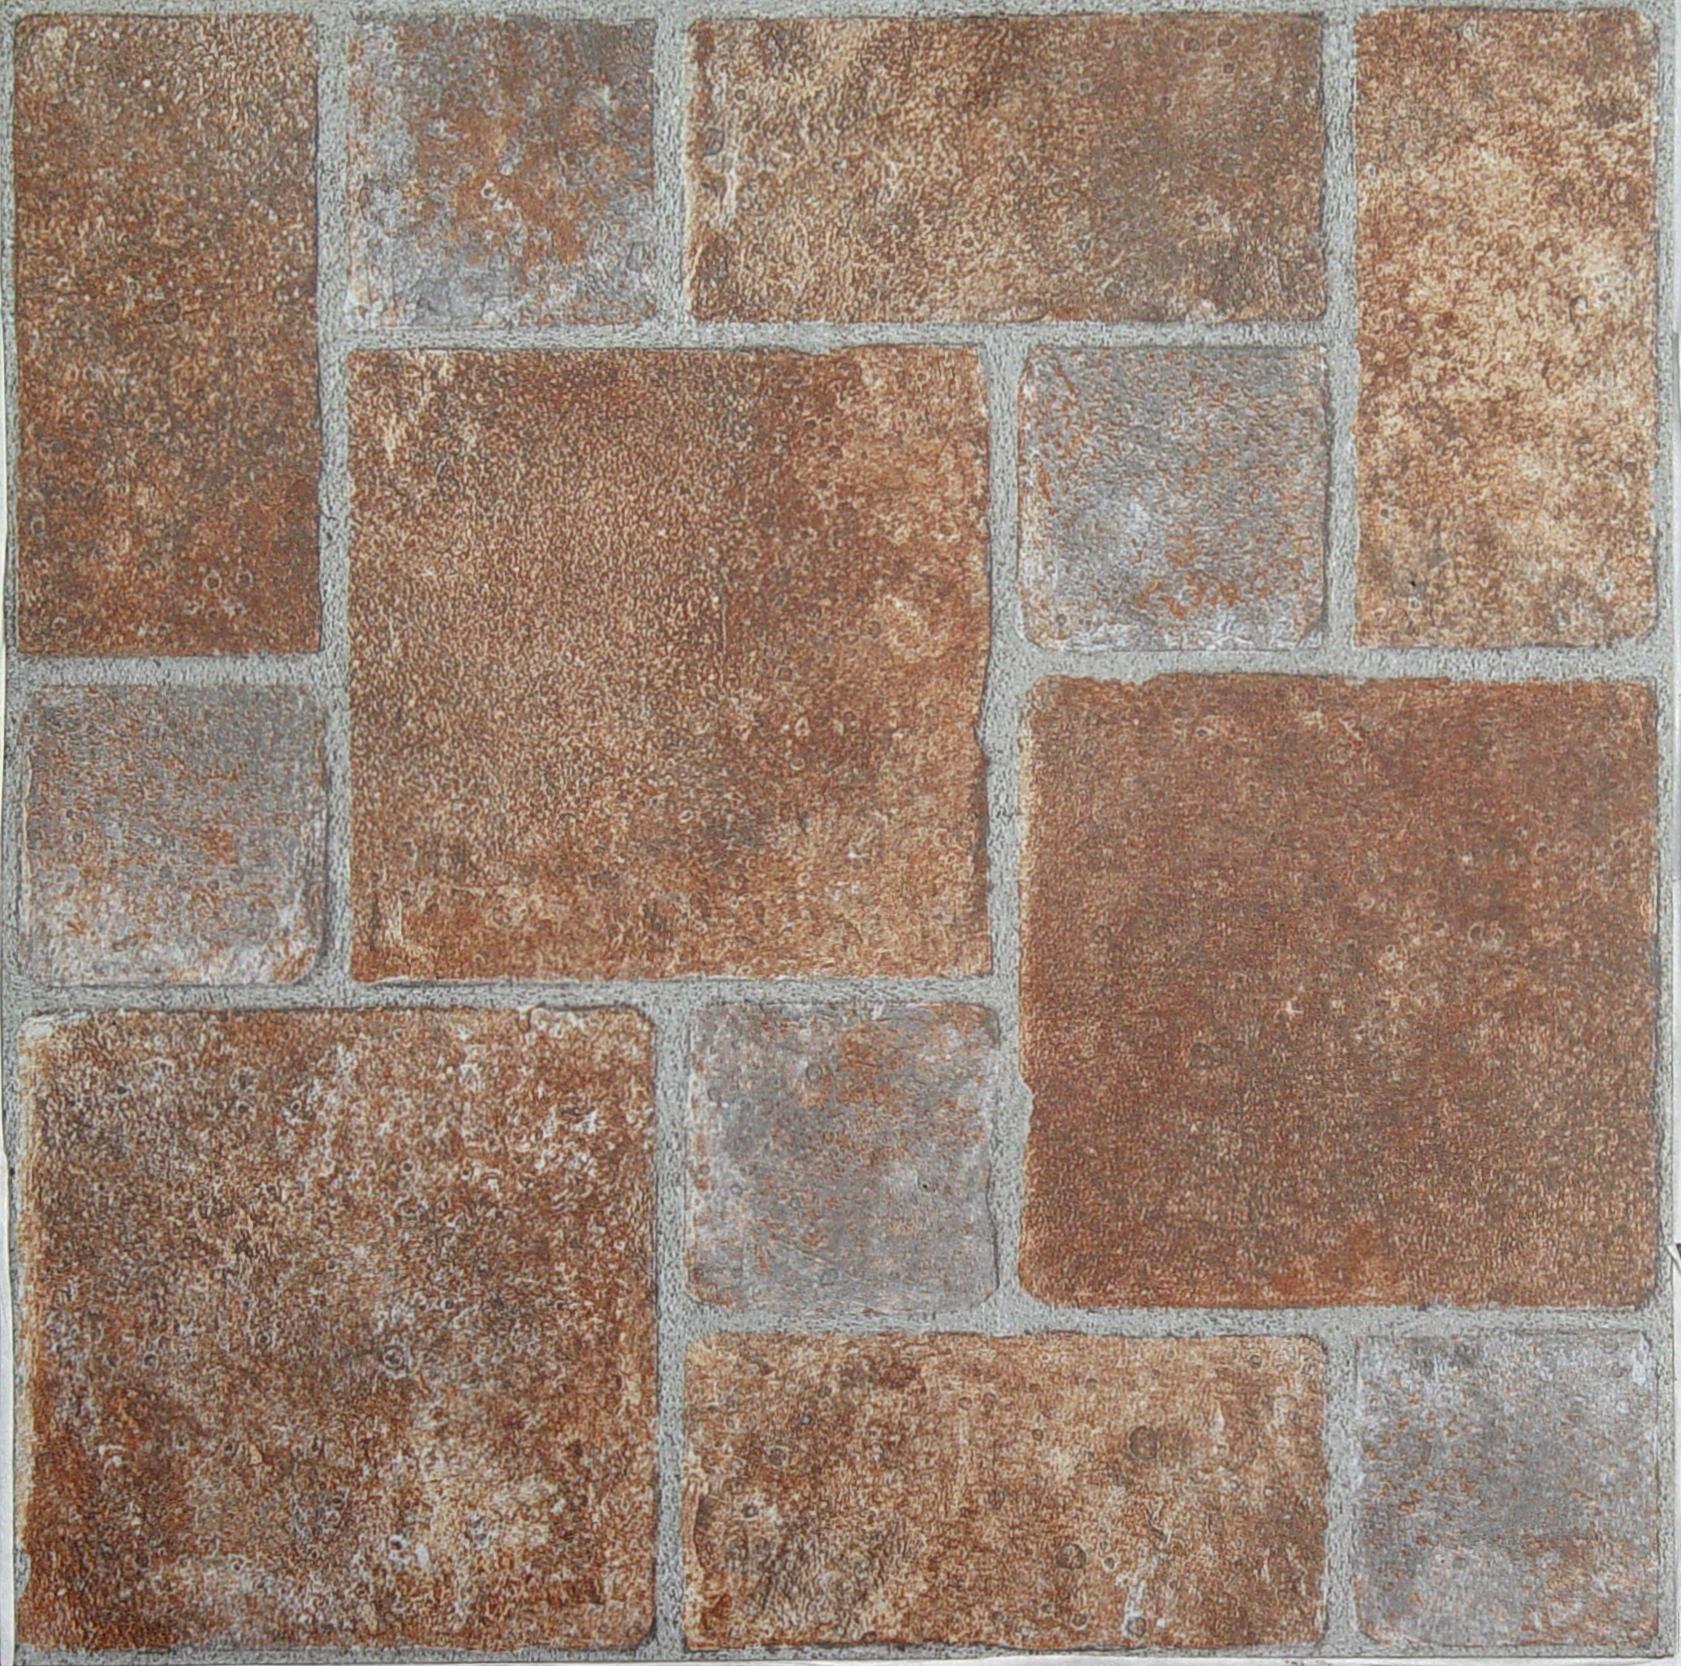 Achim nexus brick pavers 12 inch x 12 inch self adhesive vinyl achim nexus brick pavers 12 inch x 12 inch self adhesive vinyl floor tile 332 dailygadgetfo Image collections